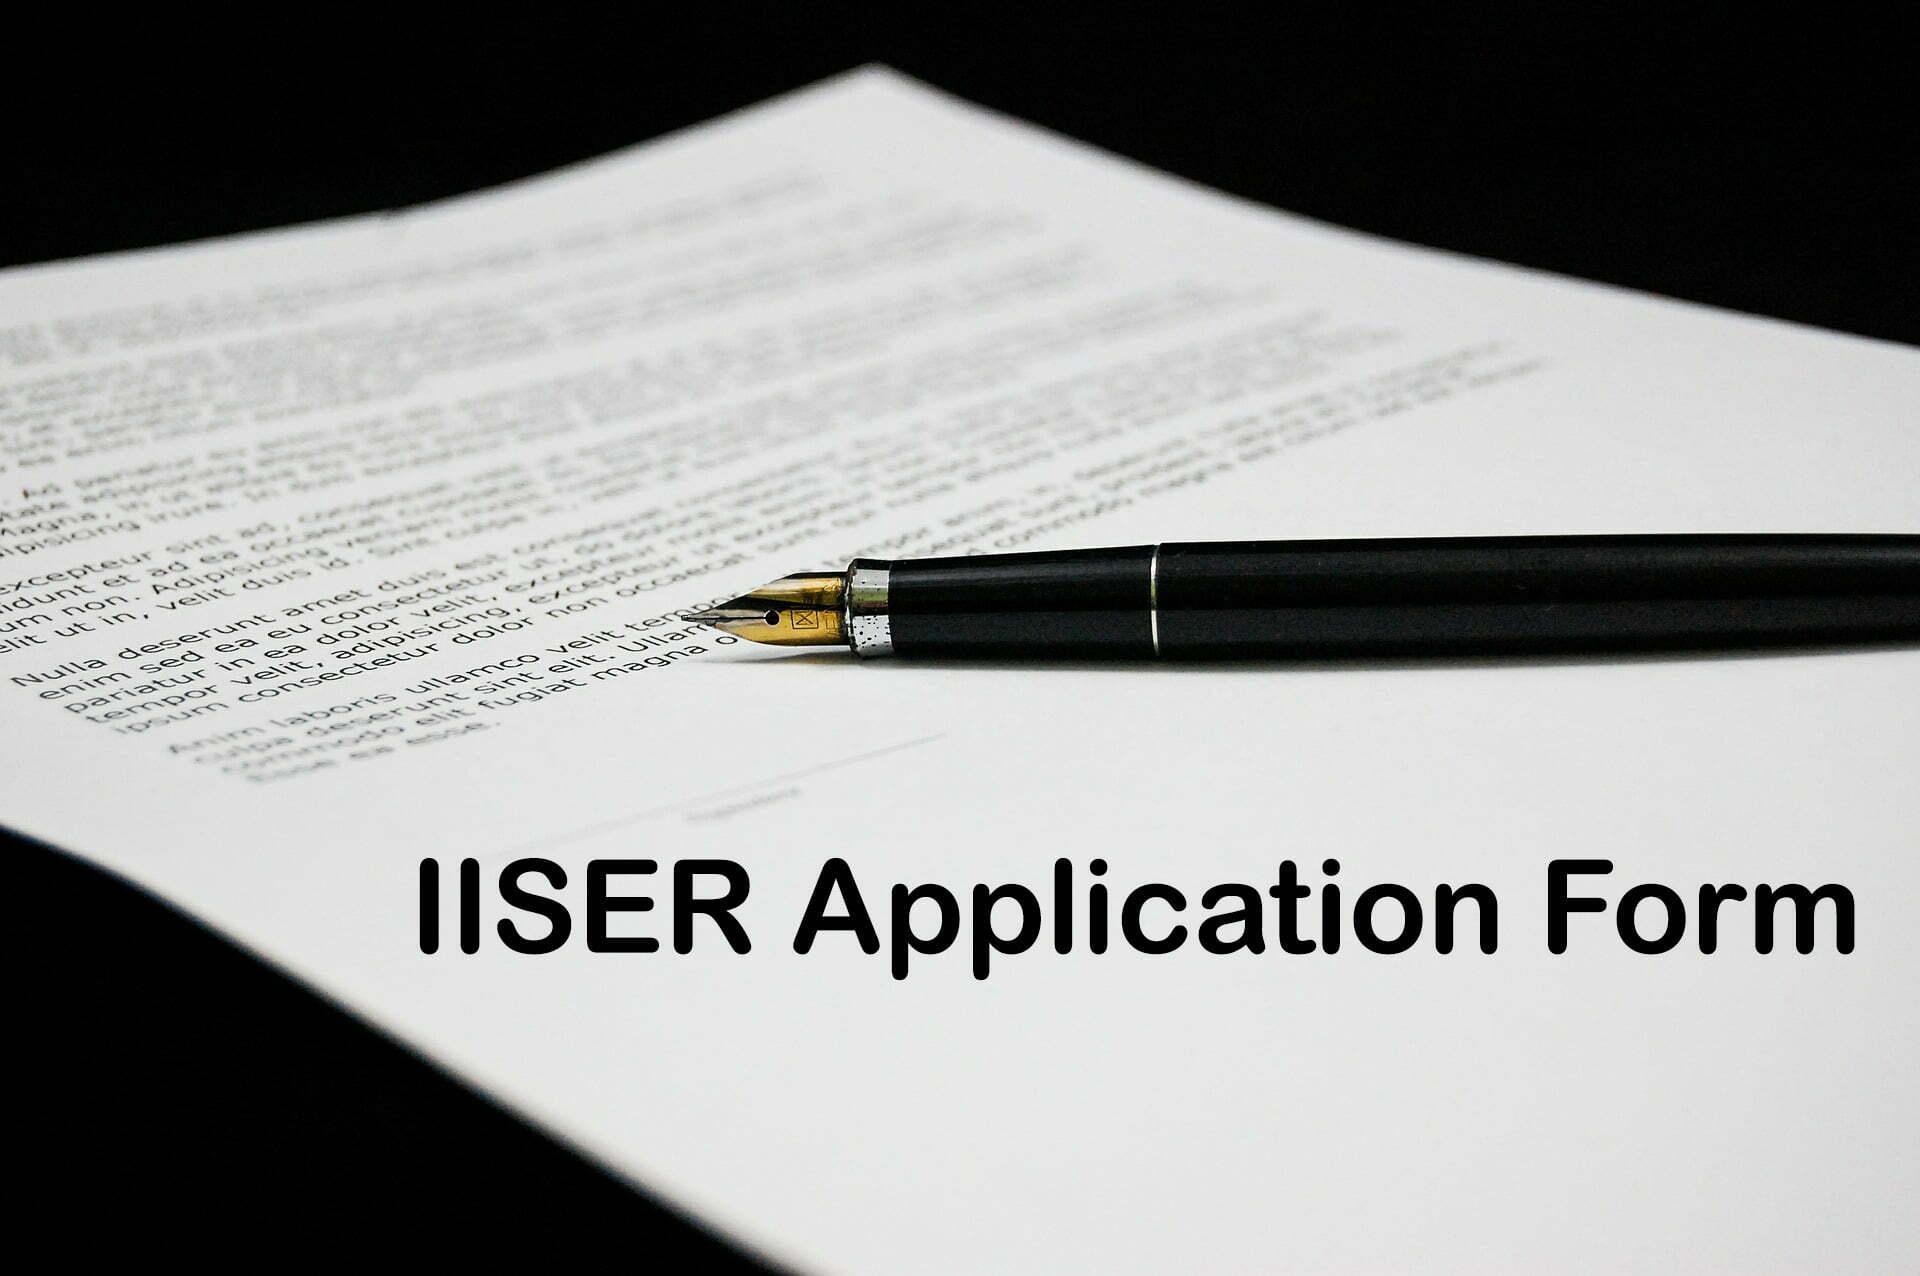 IISER Application Form